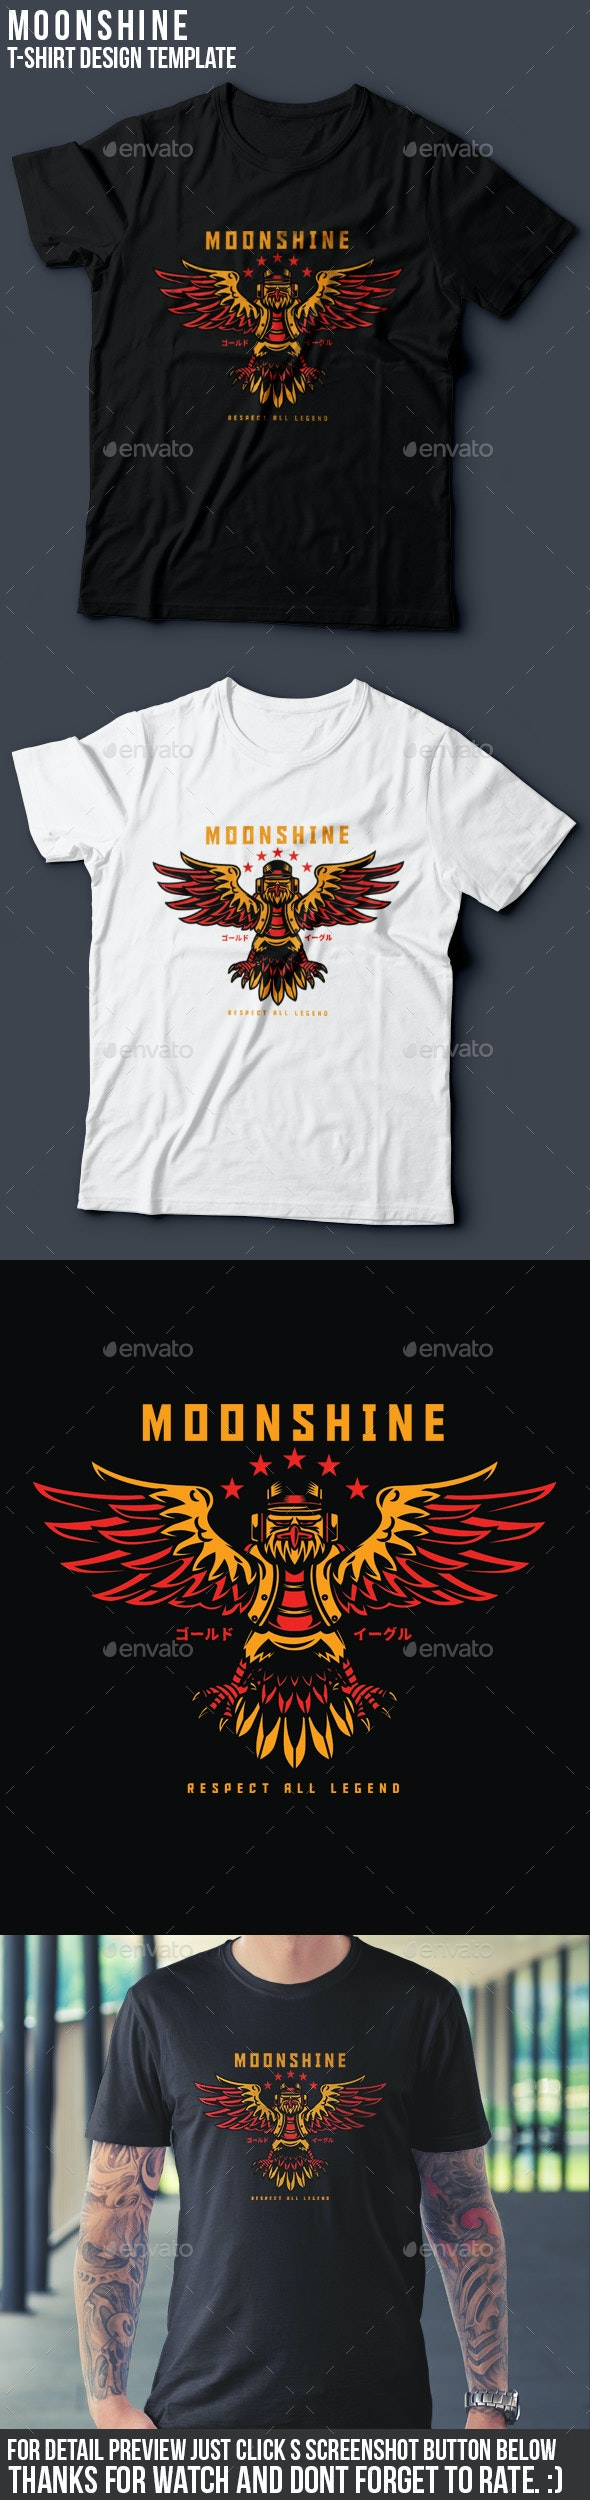 Moonshine T-Shirt Design - Clean Designs